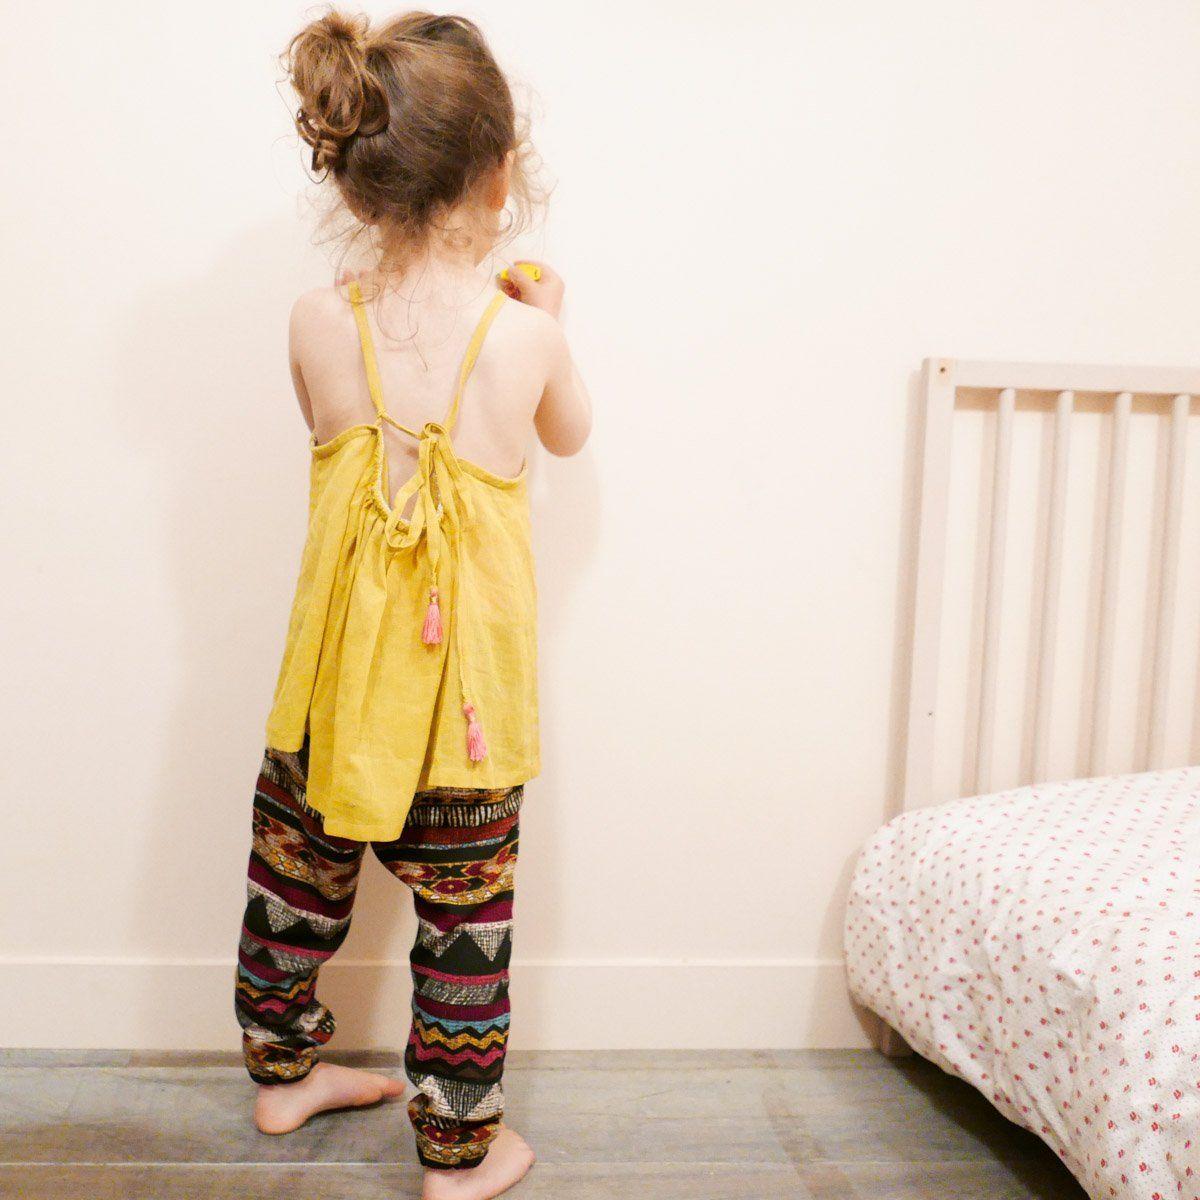 Pochette patron de couture DAKAR Pantalon ou Short Enfant